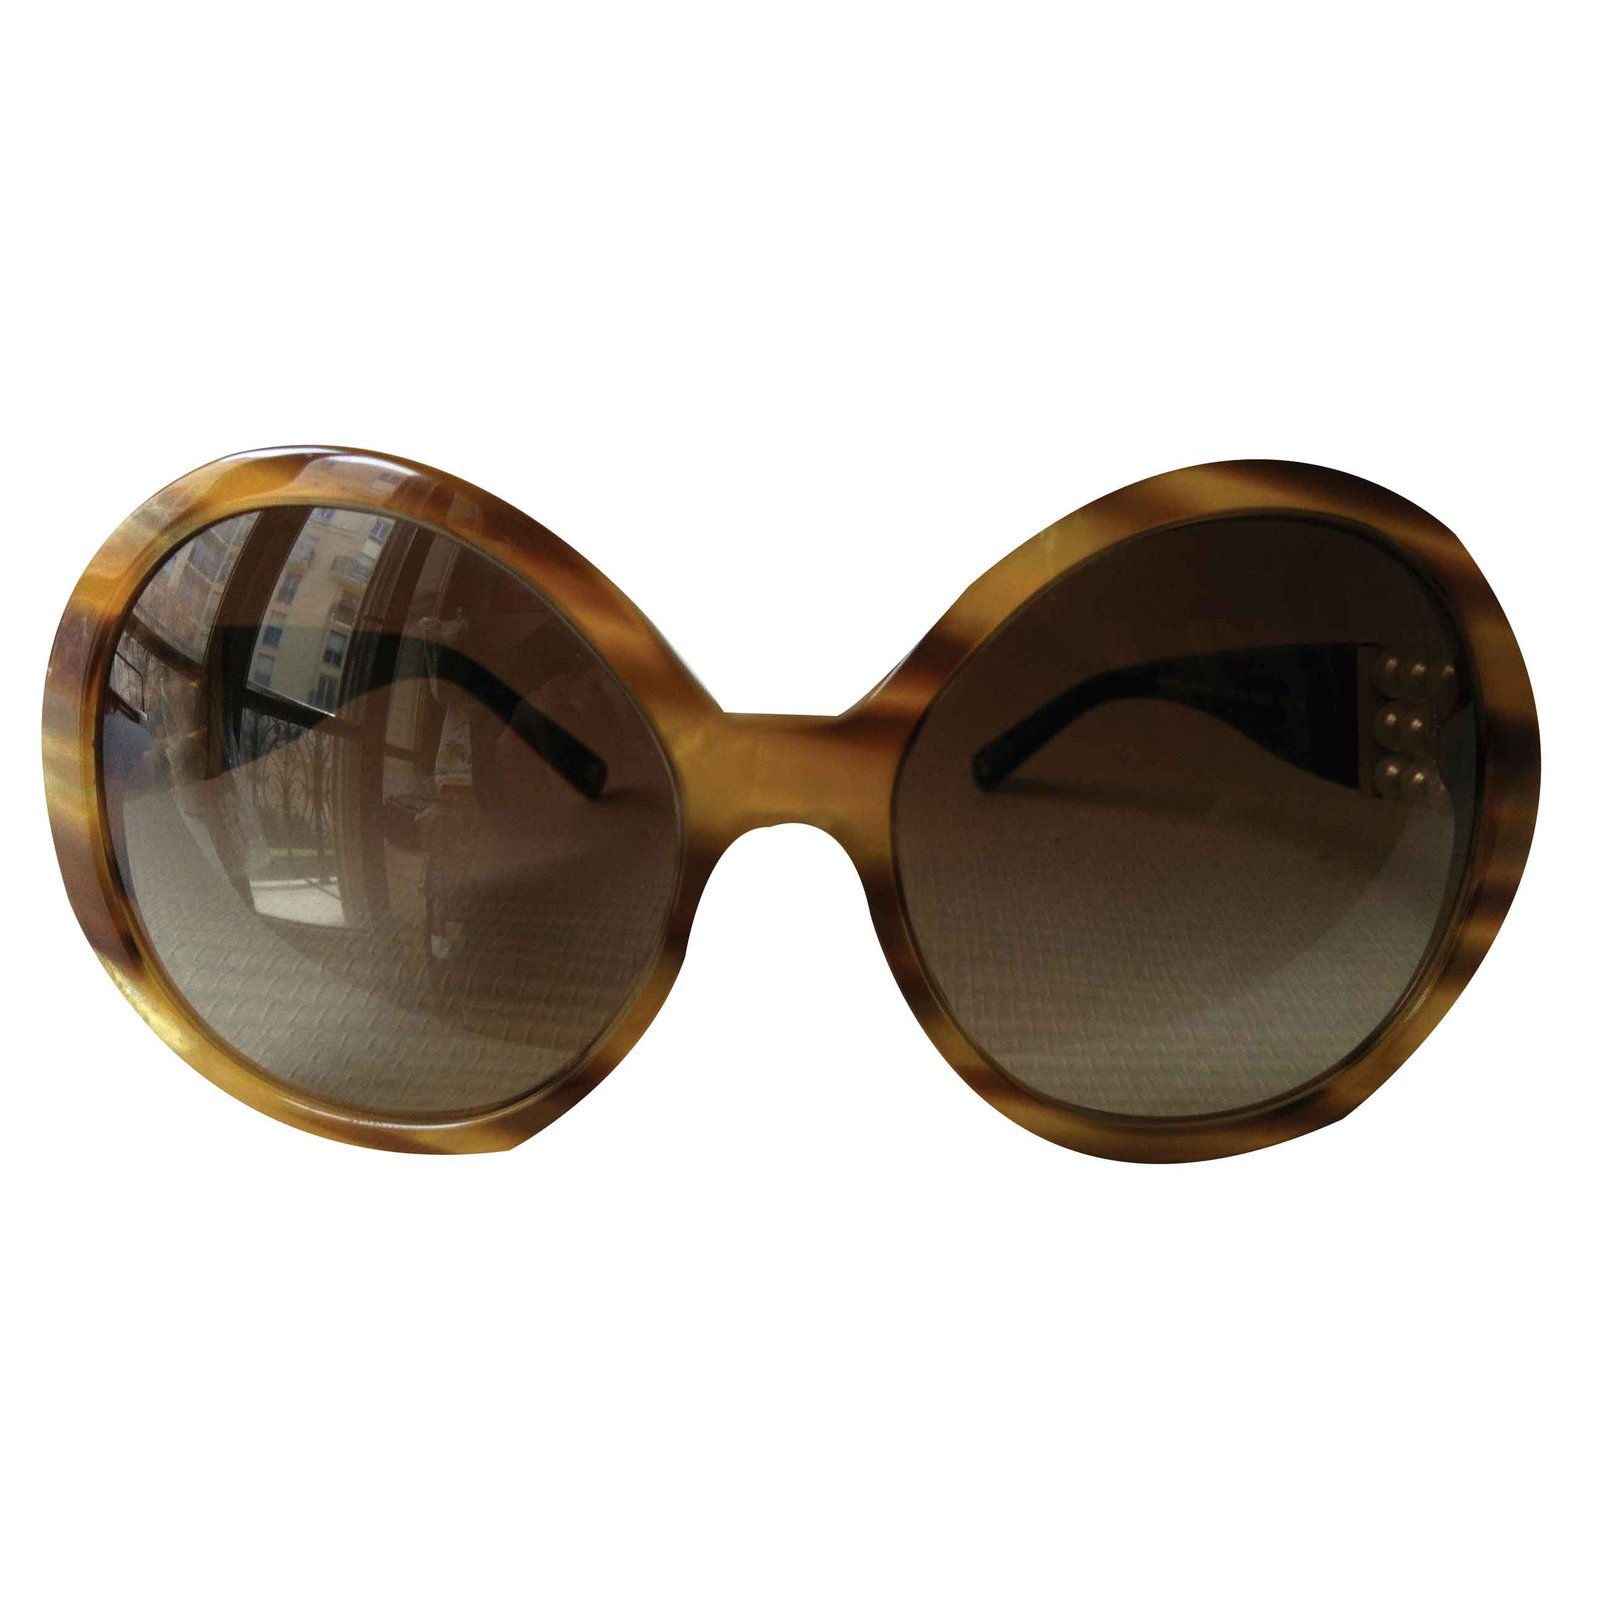 cde75c37cb5 Chanel Sunglasses Sunglasses Acetate Light brown ref.19929 - Joli Closet